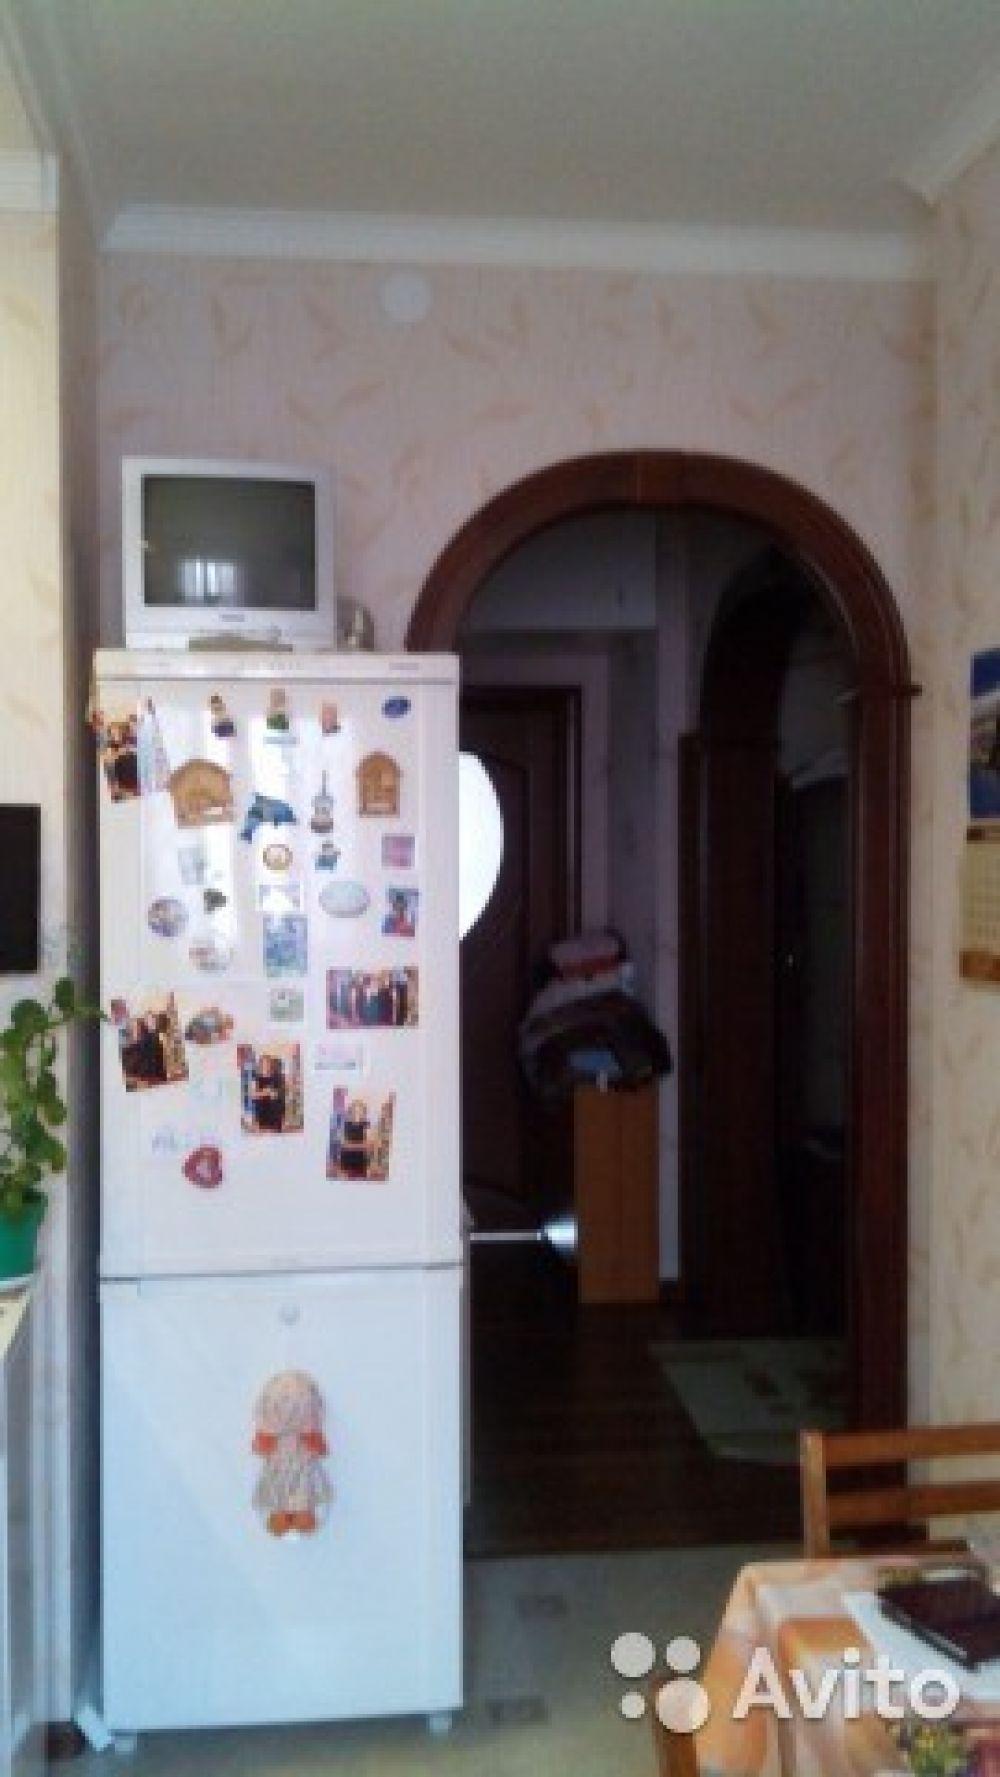 Двухкомнатная квартира  60 м2, микрорайон Богородский 6, фото 11